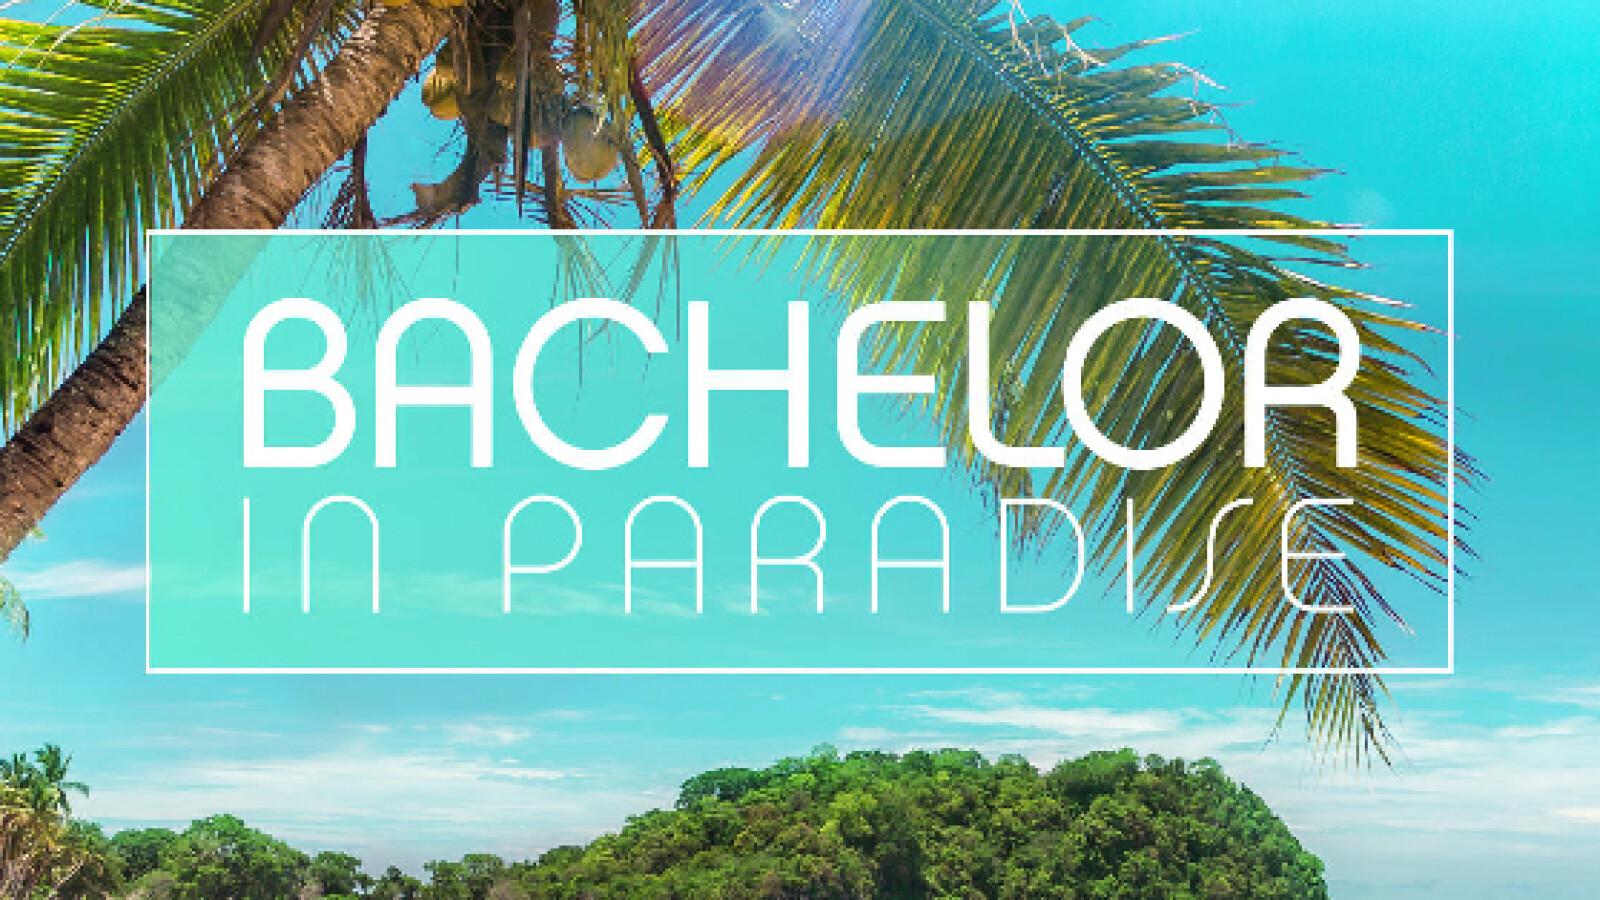 Bachelor in Paradise 2019: Staffel 2 im Stream bei TV Now sehen